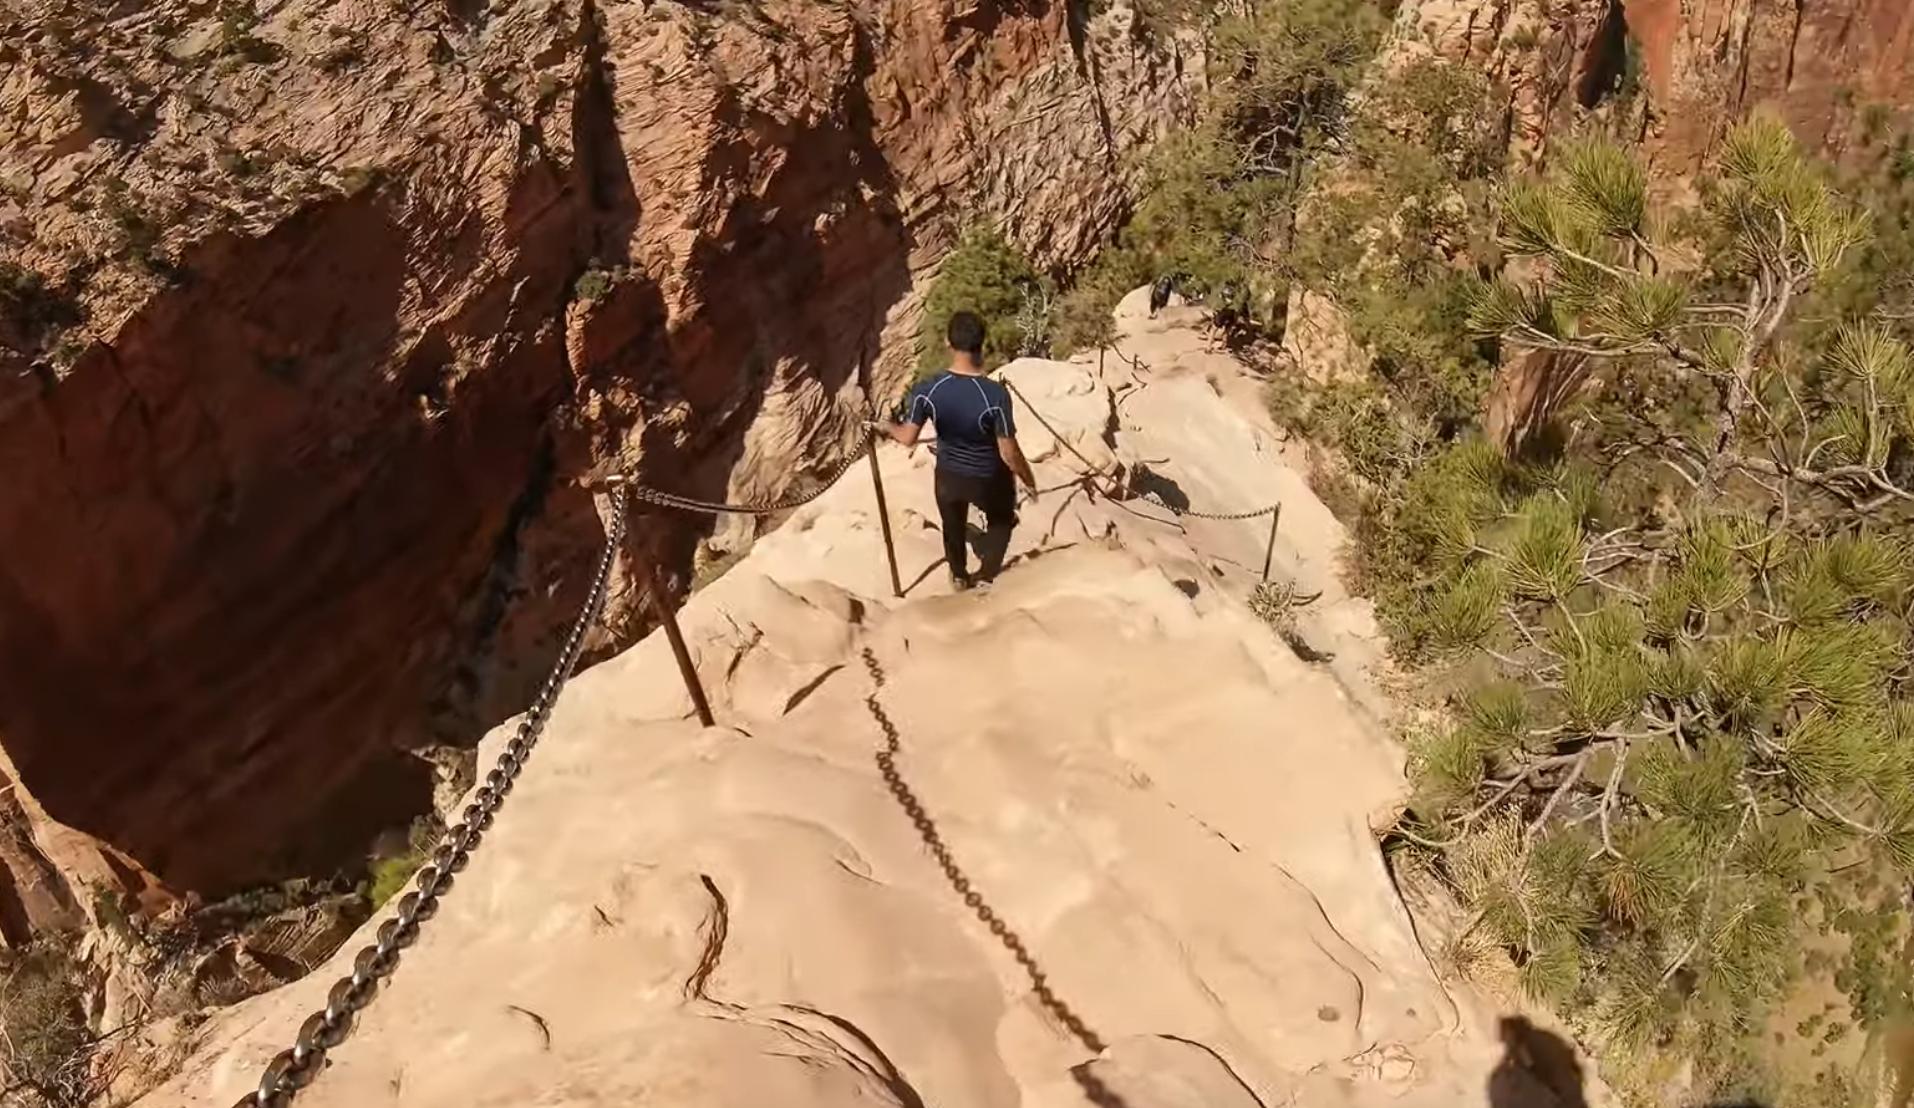 My Experience hiking Angel's Landing at Zion, Utah